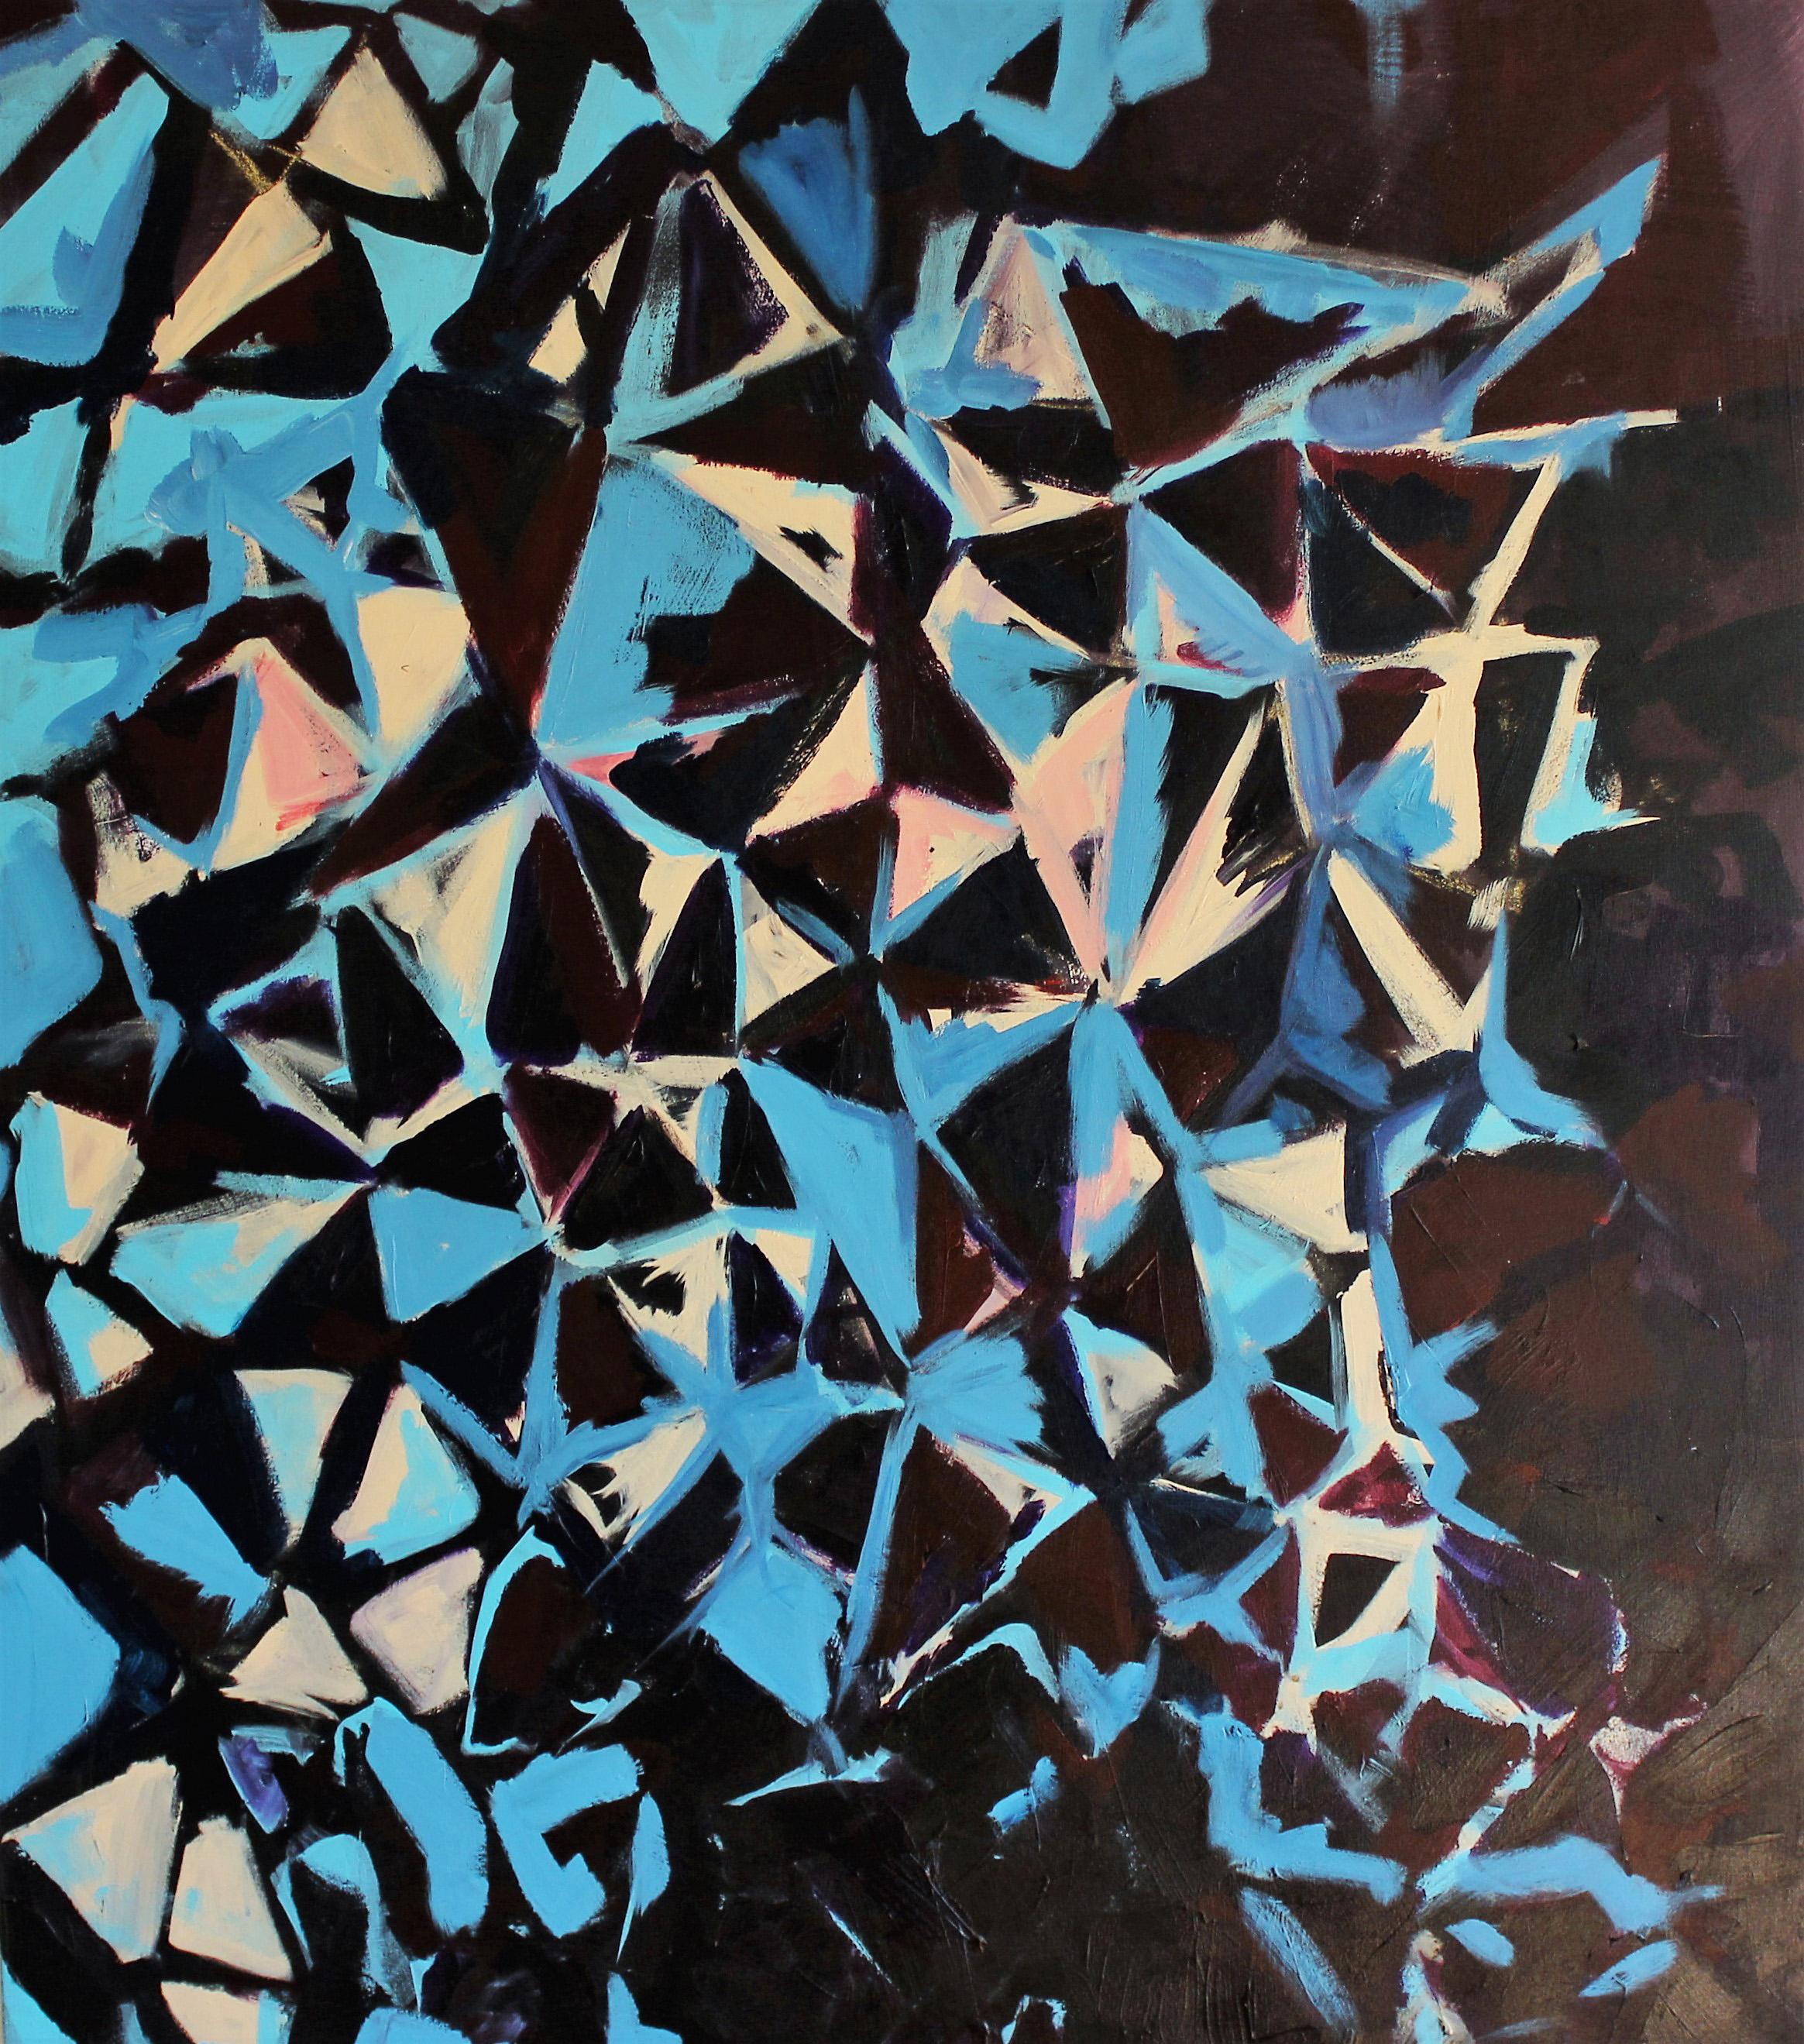 Study of a Blue & Pink Geometric